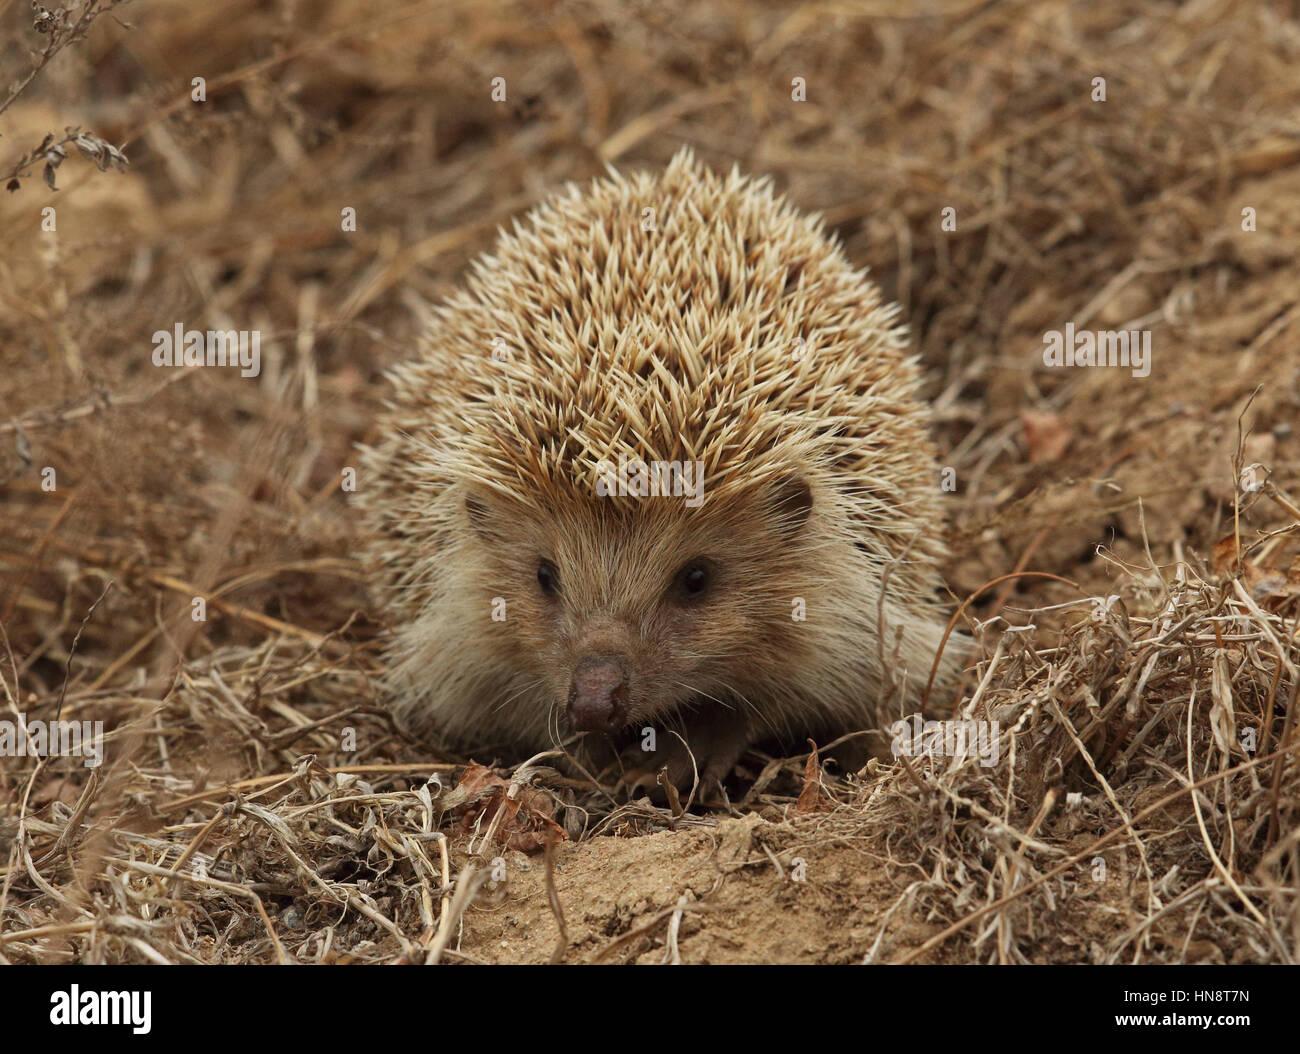 Amur Hedgehog (Erinaceus amurensis) adult on dry ground  Beidaihe, Hebei, China   May - Stock Image